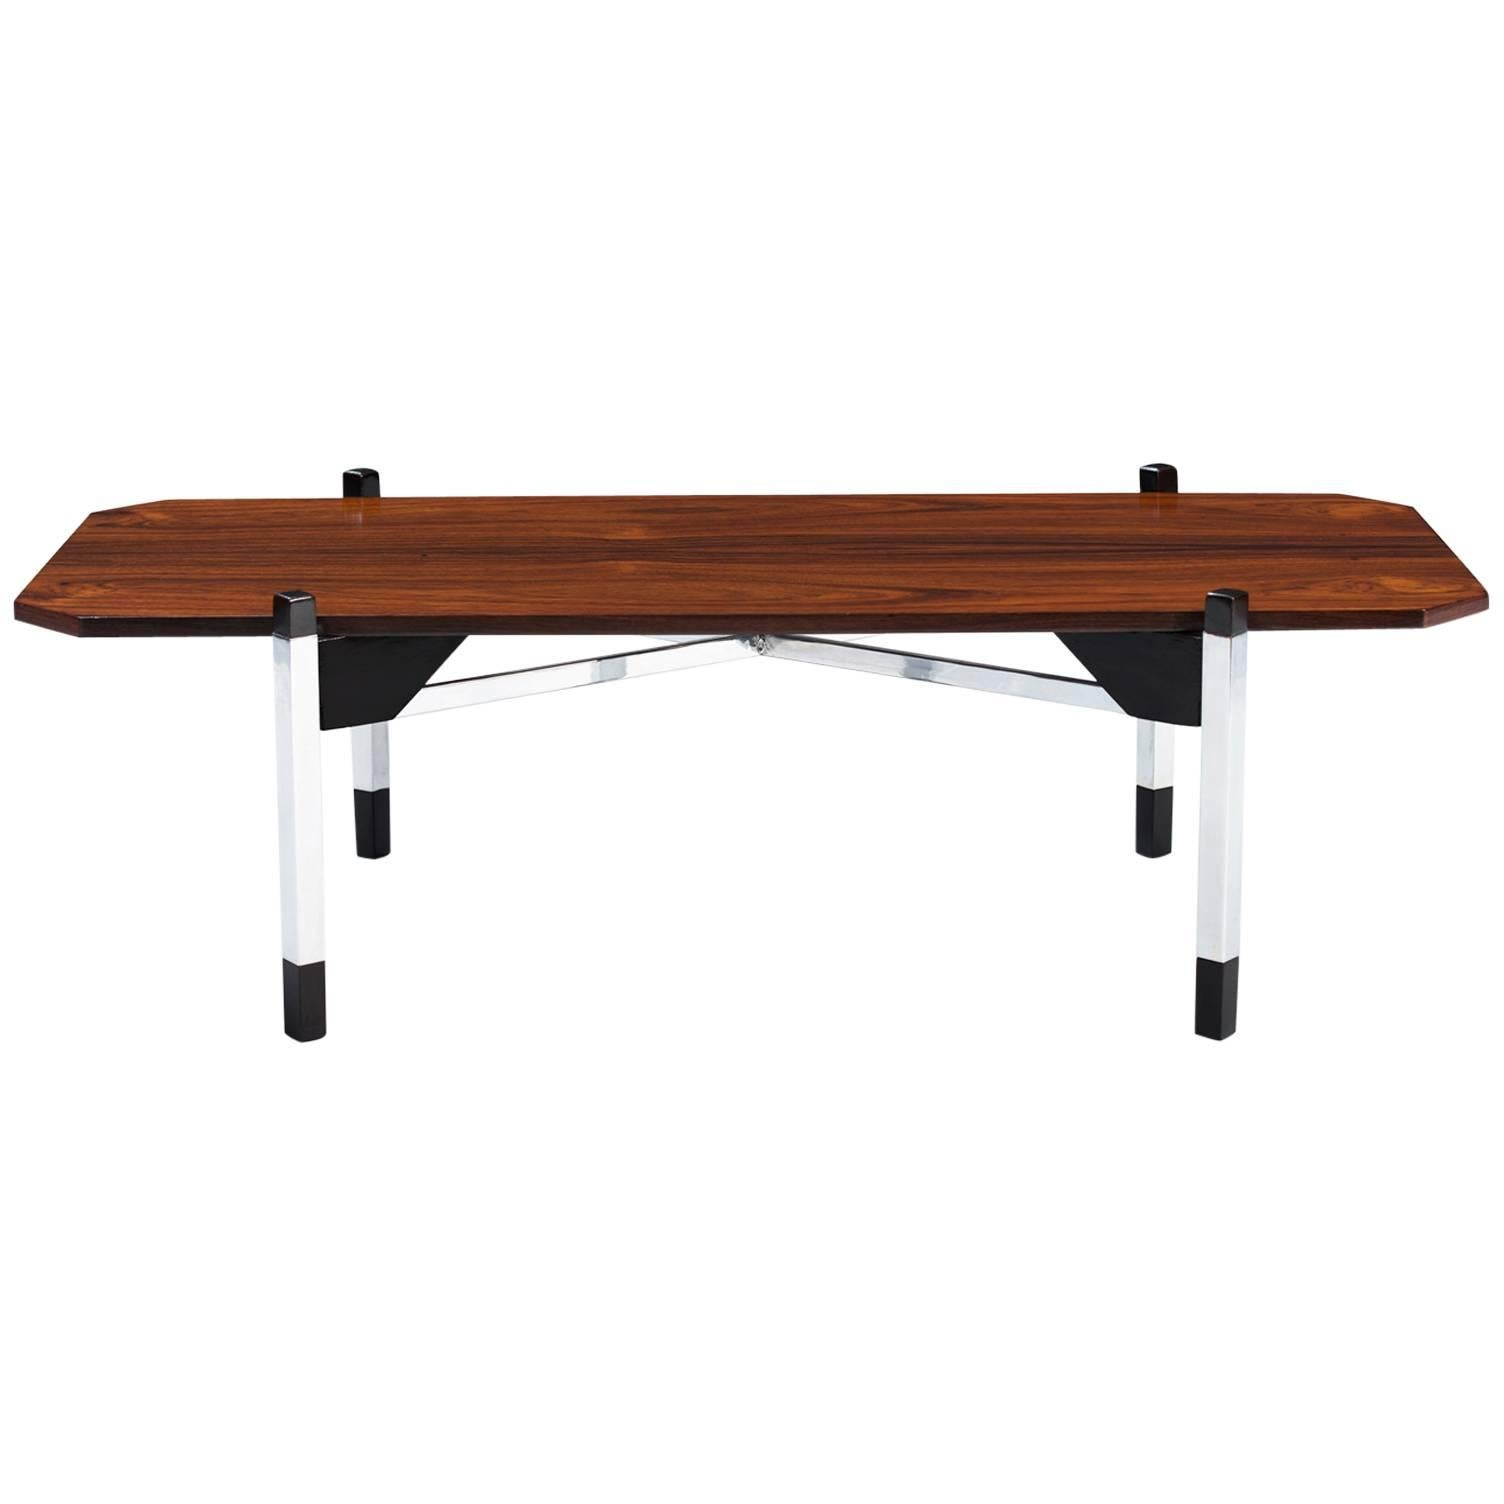 Italian Rosewood and Chrome Coffee Table